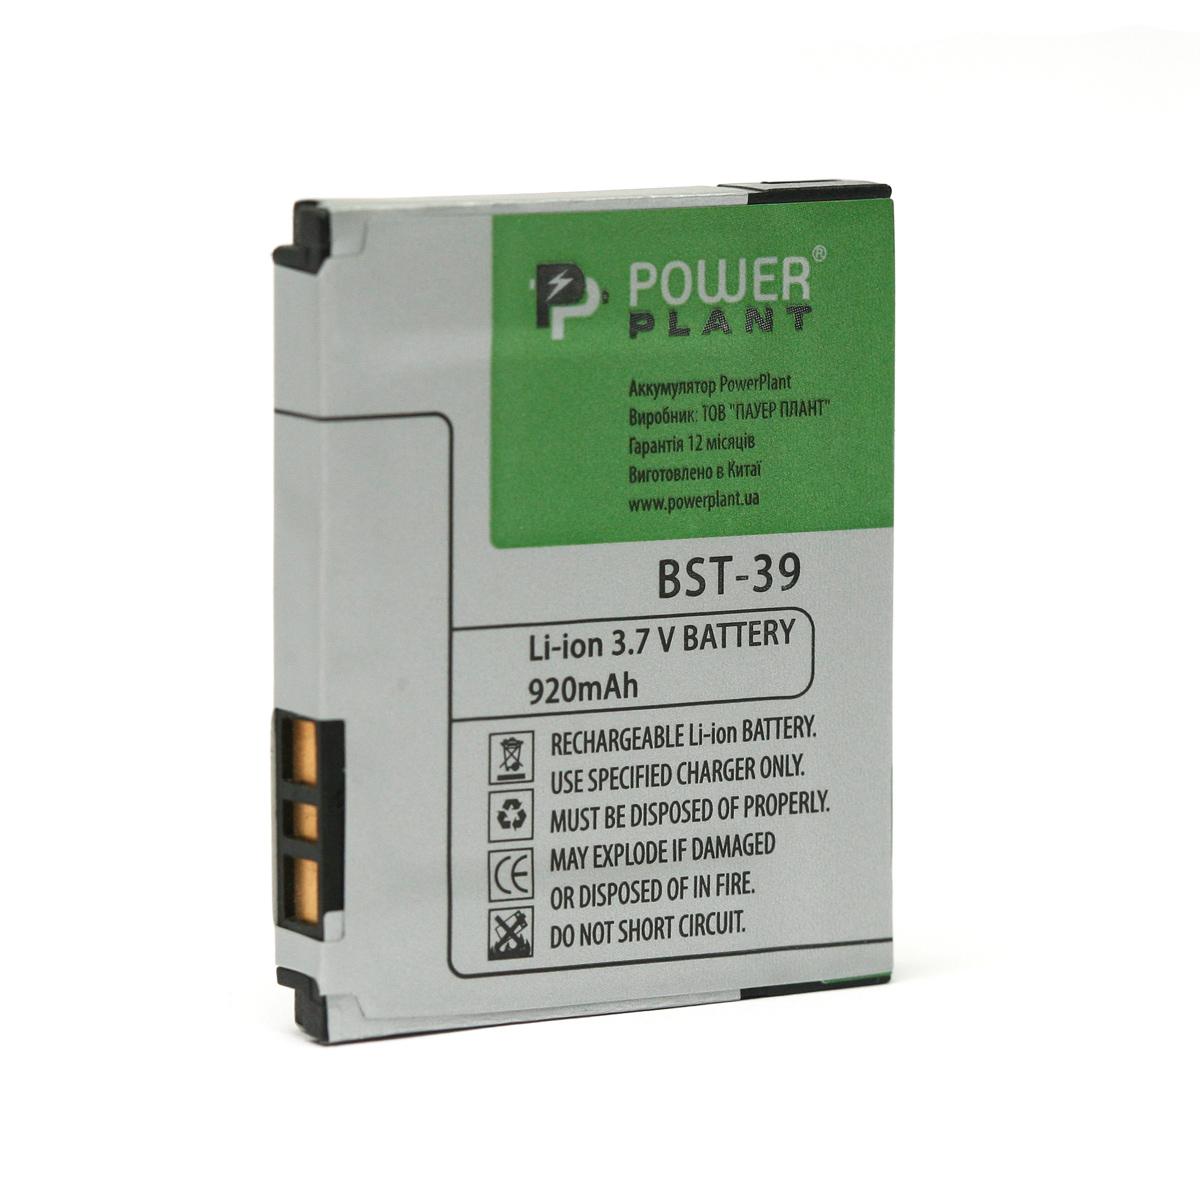 Купить Аккумулятор PowerPlant Sony Ericsson T707 (BST-39) 920mAh